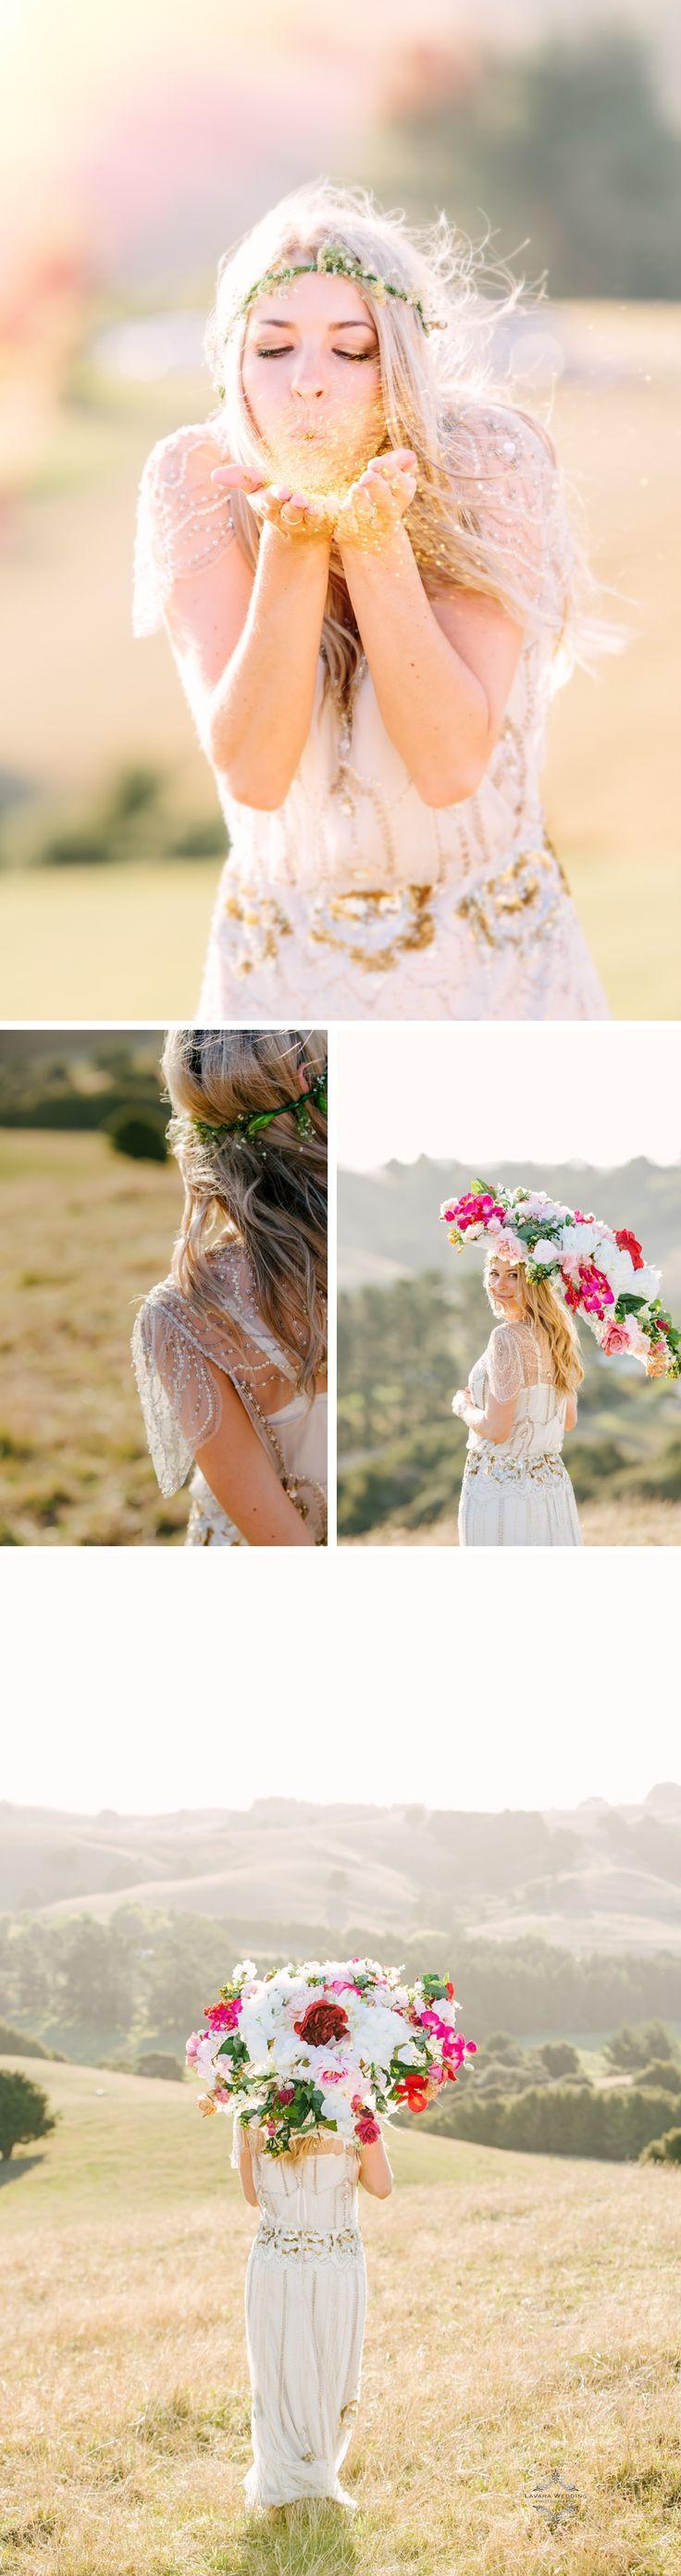 glitter blowing wedding prop, handmade floral umbrella prop by lavara photography